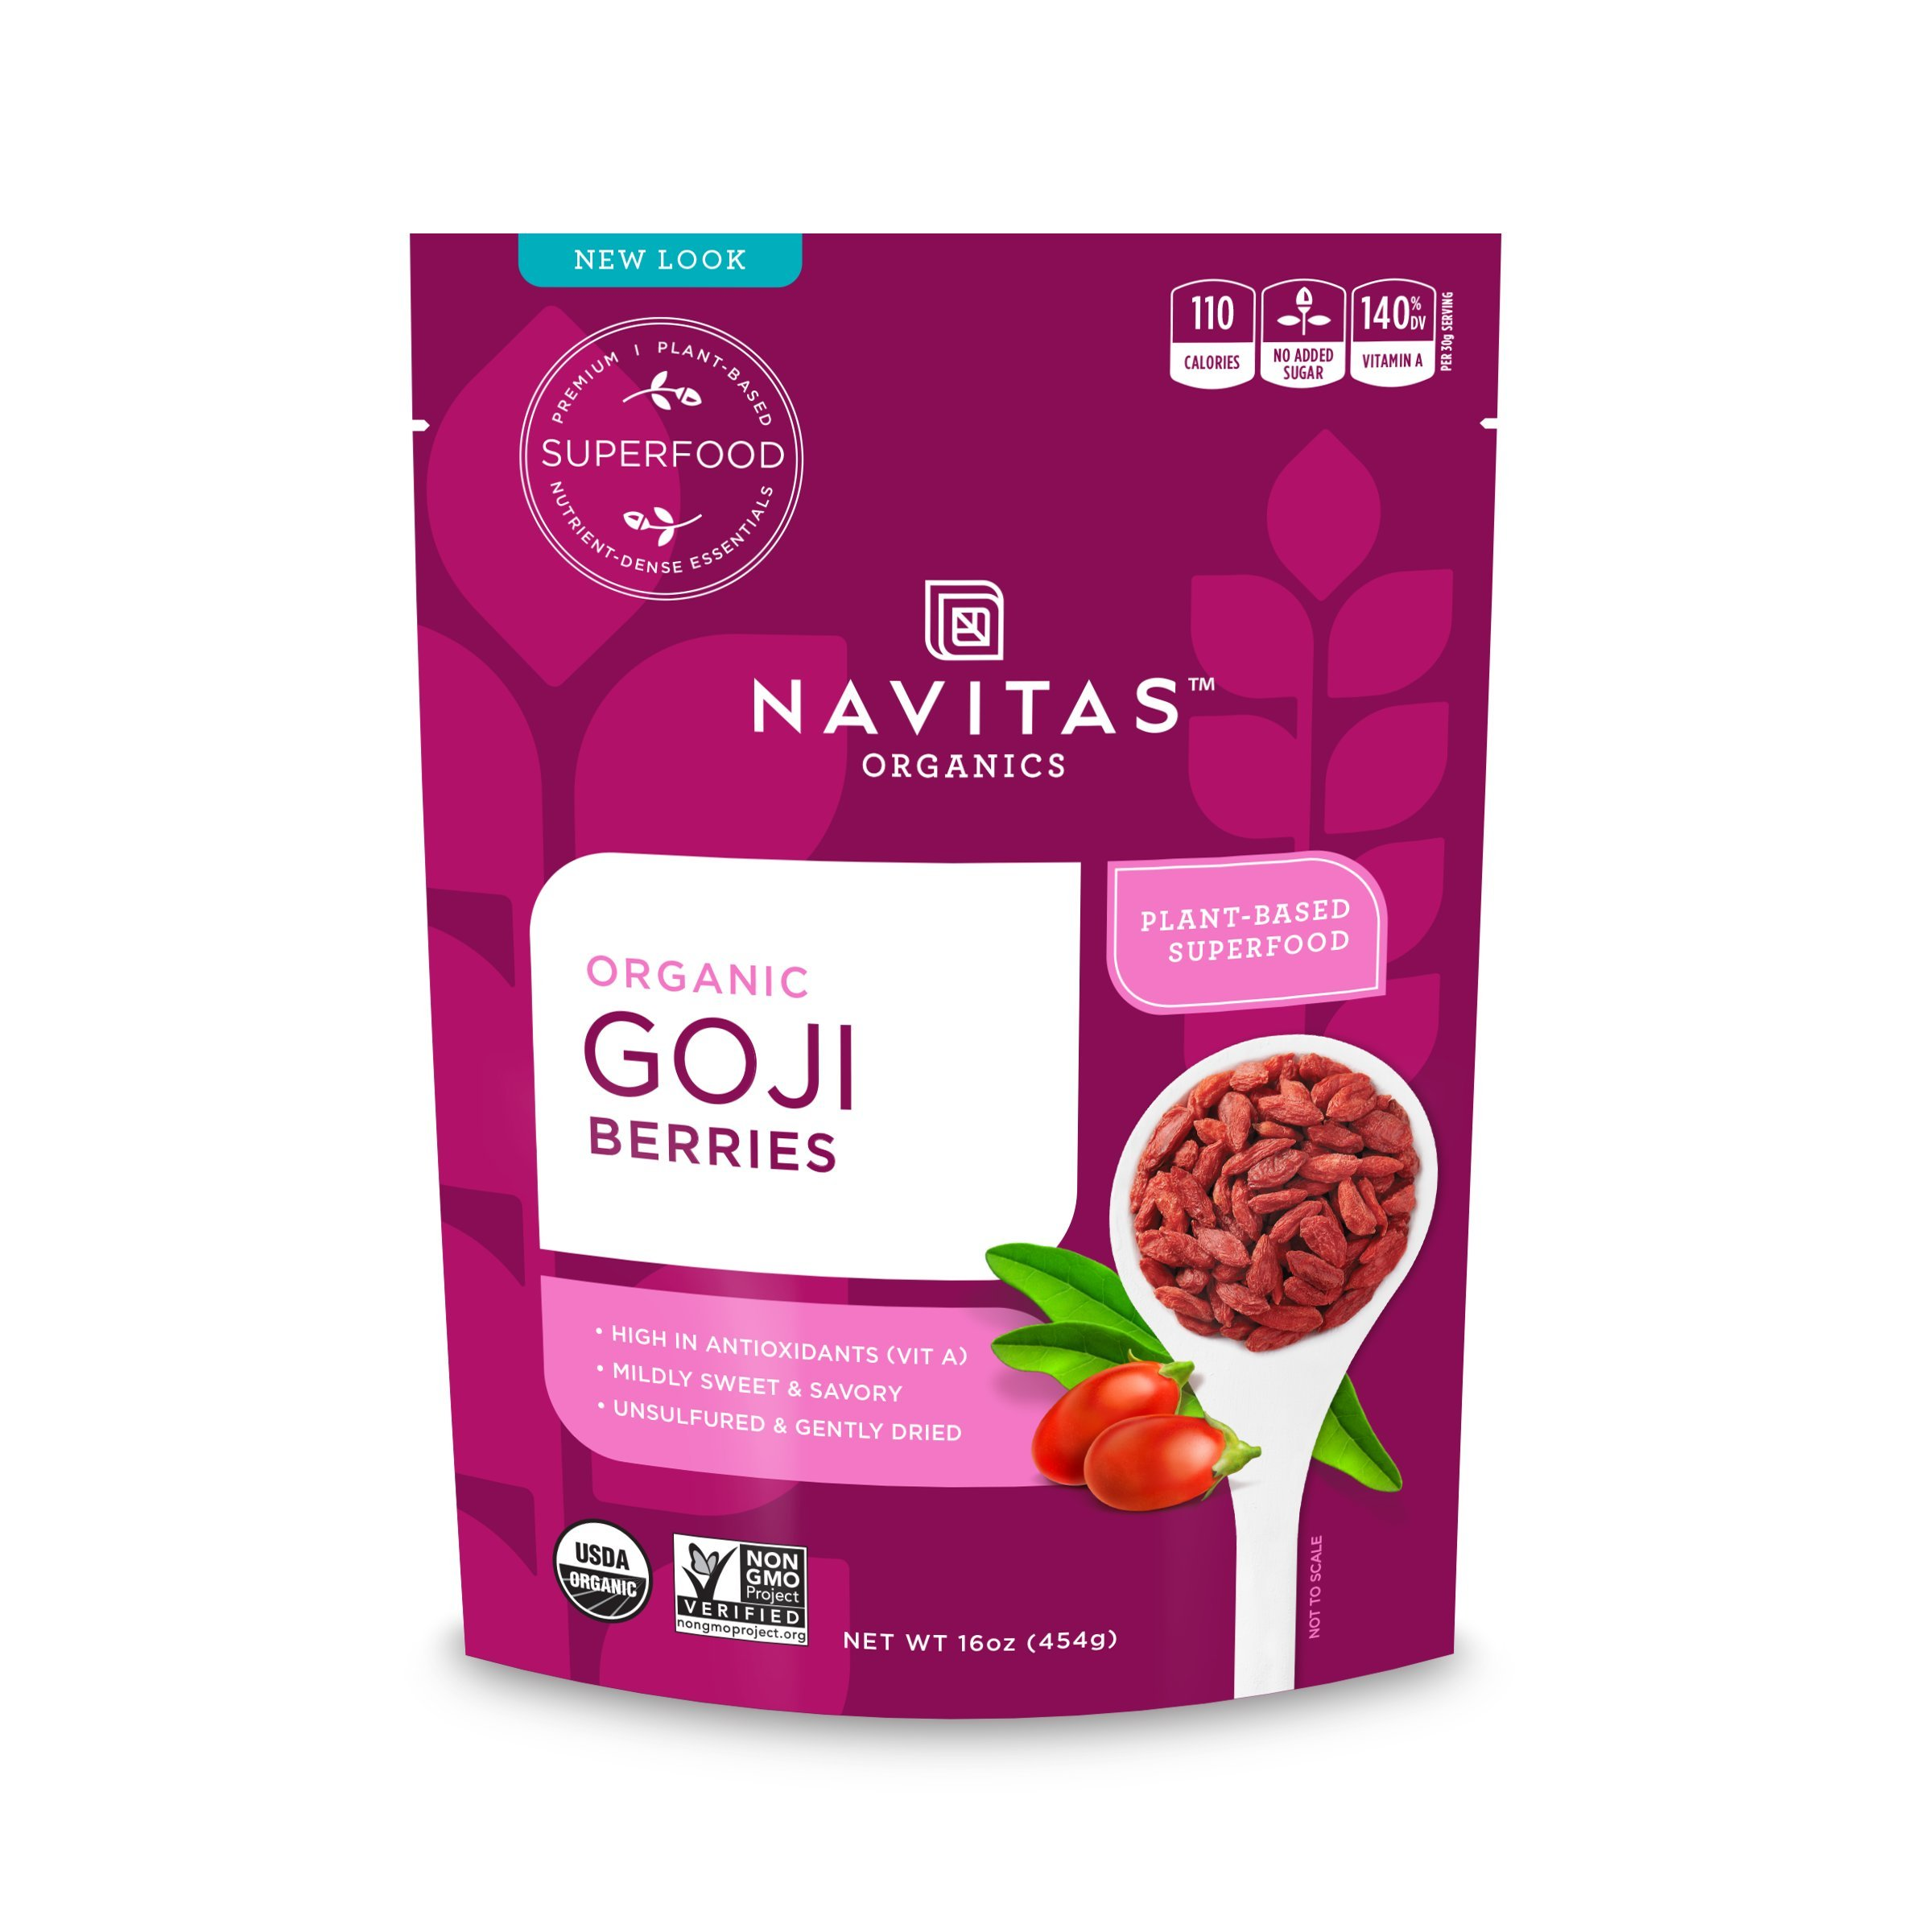 Navitas Organics Goji Berries, 16 oz. Bag — Organic, Non-GMO, Sun-Dried, Sulfite-Free